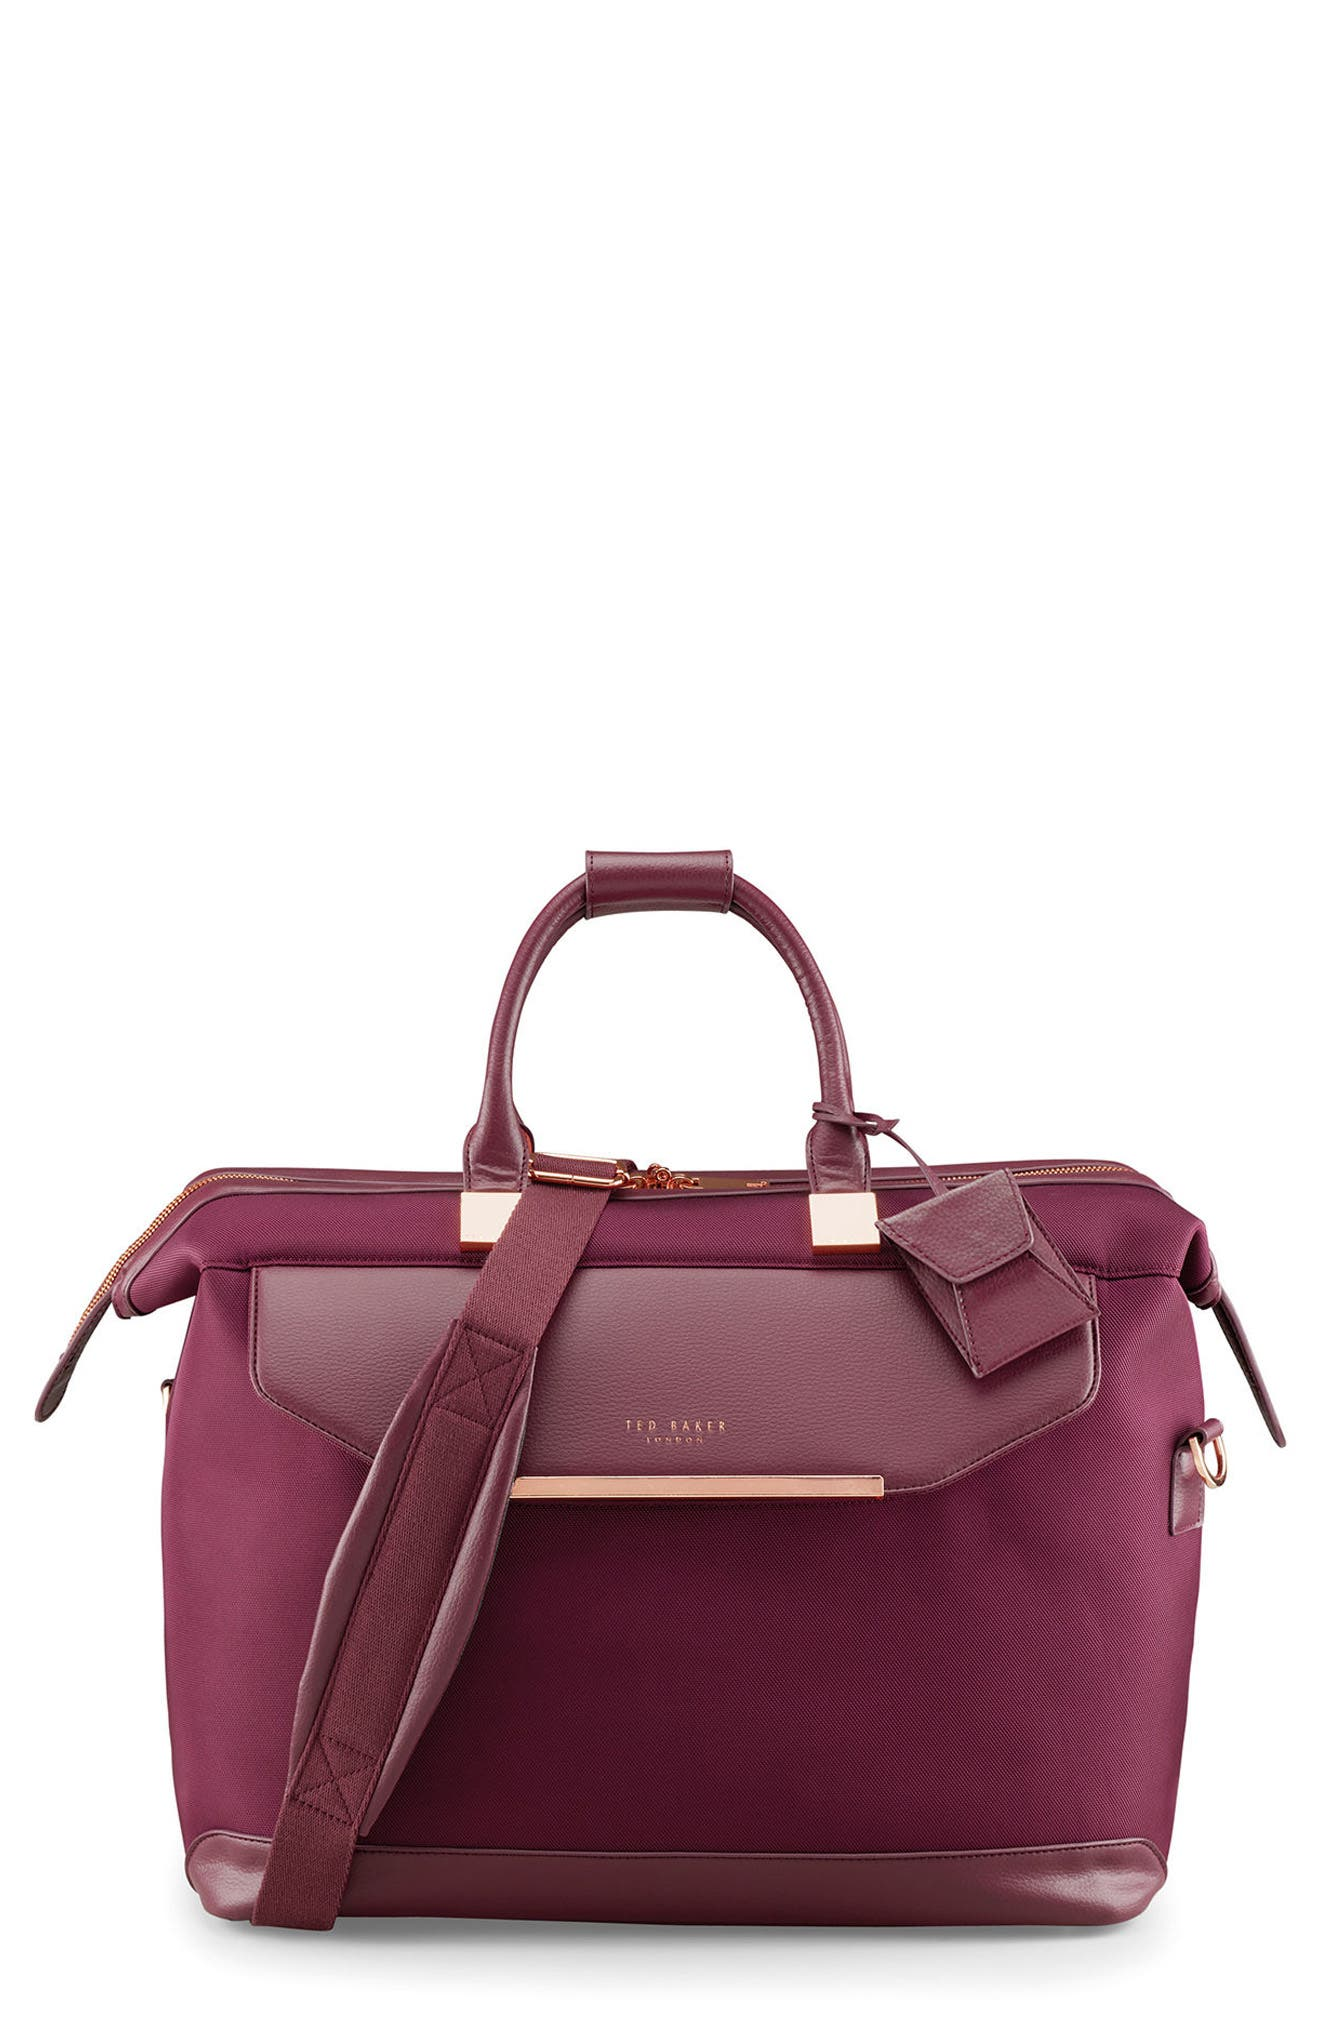 Small Clipper Duffel Bag,                             Main thumbnail 1, color,                             Burgundy